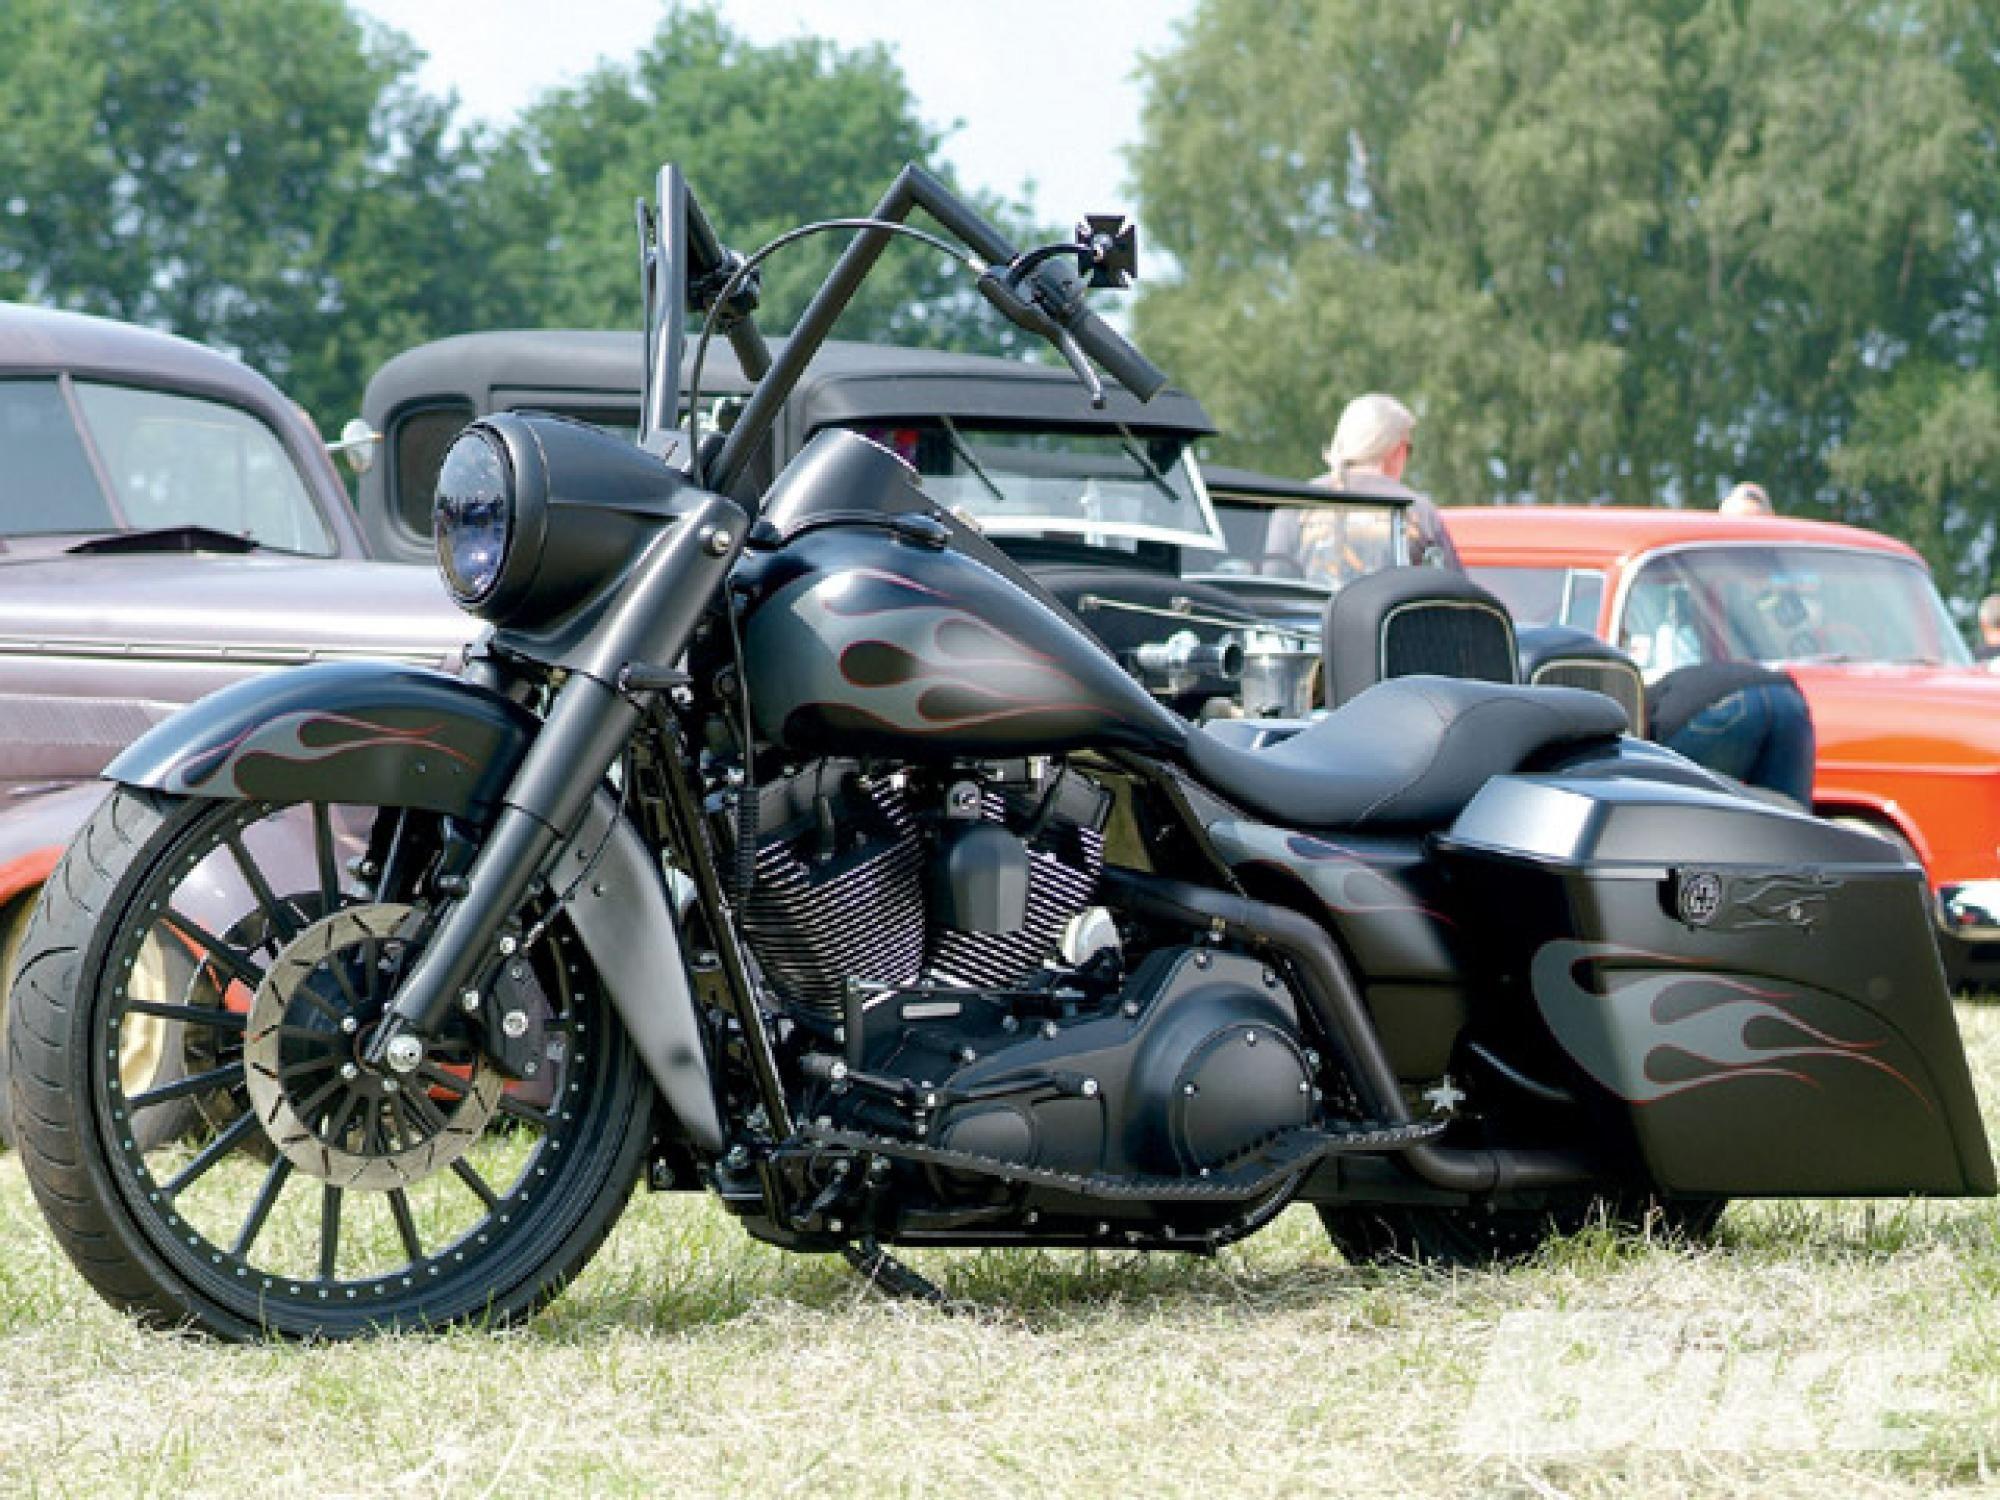 2008 Harley-Davidson Road King - Bad King   Hot Bike